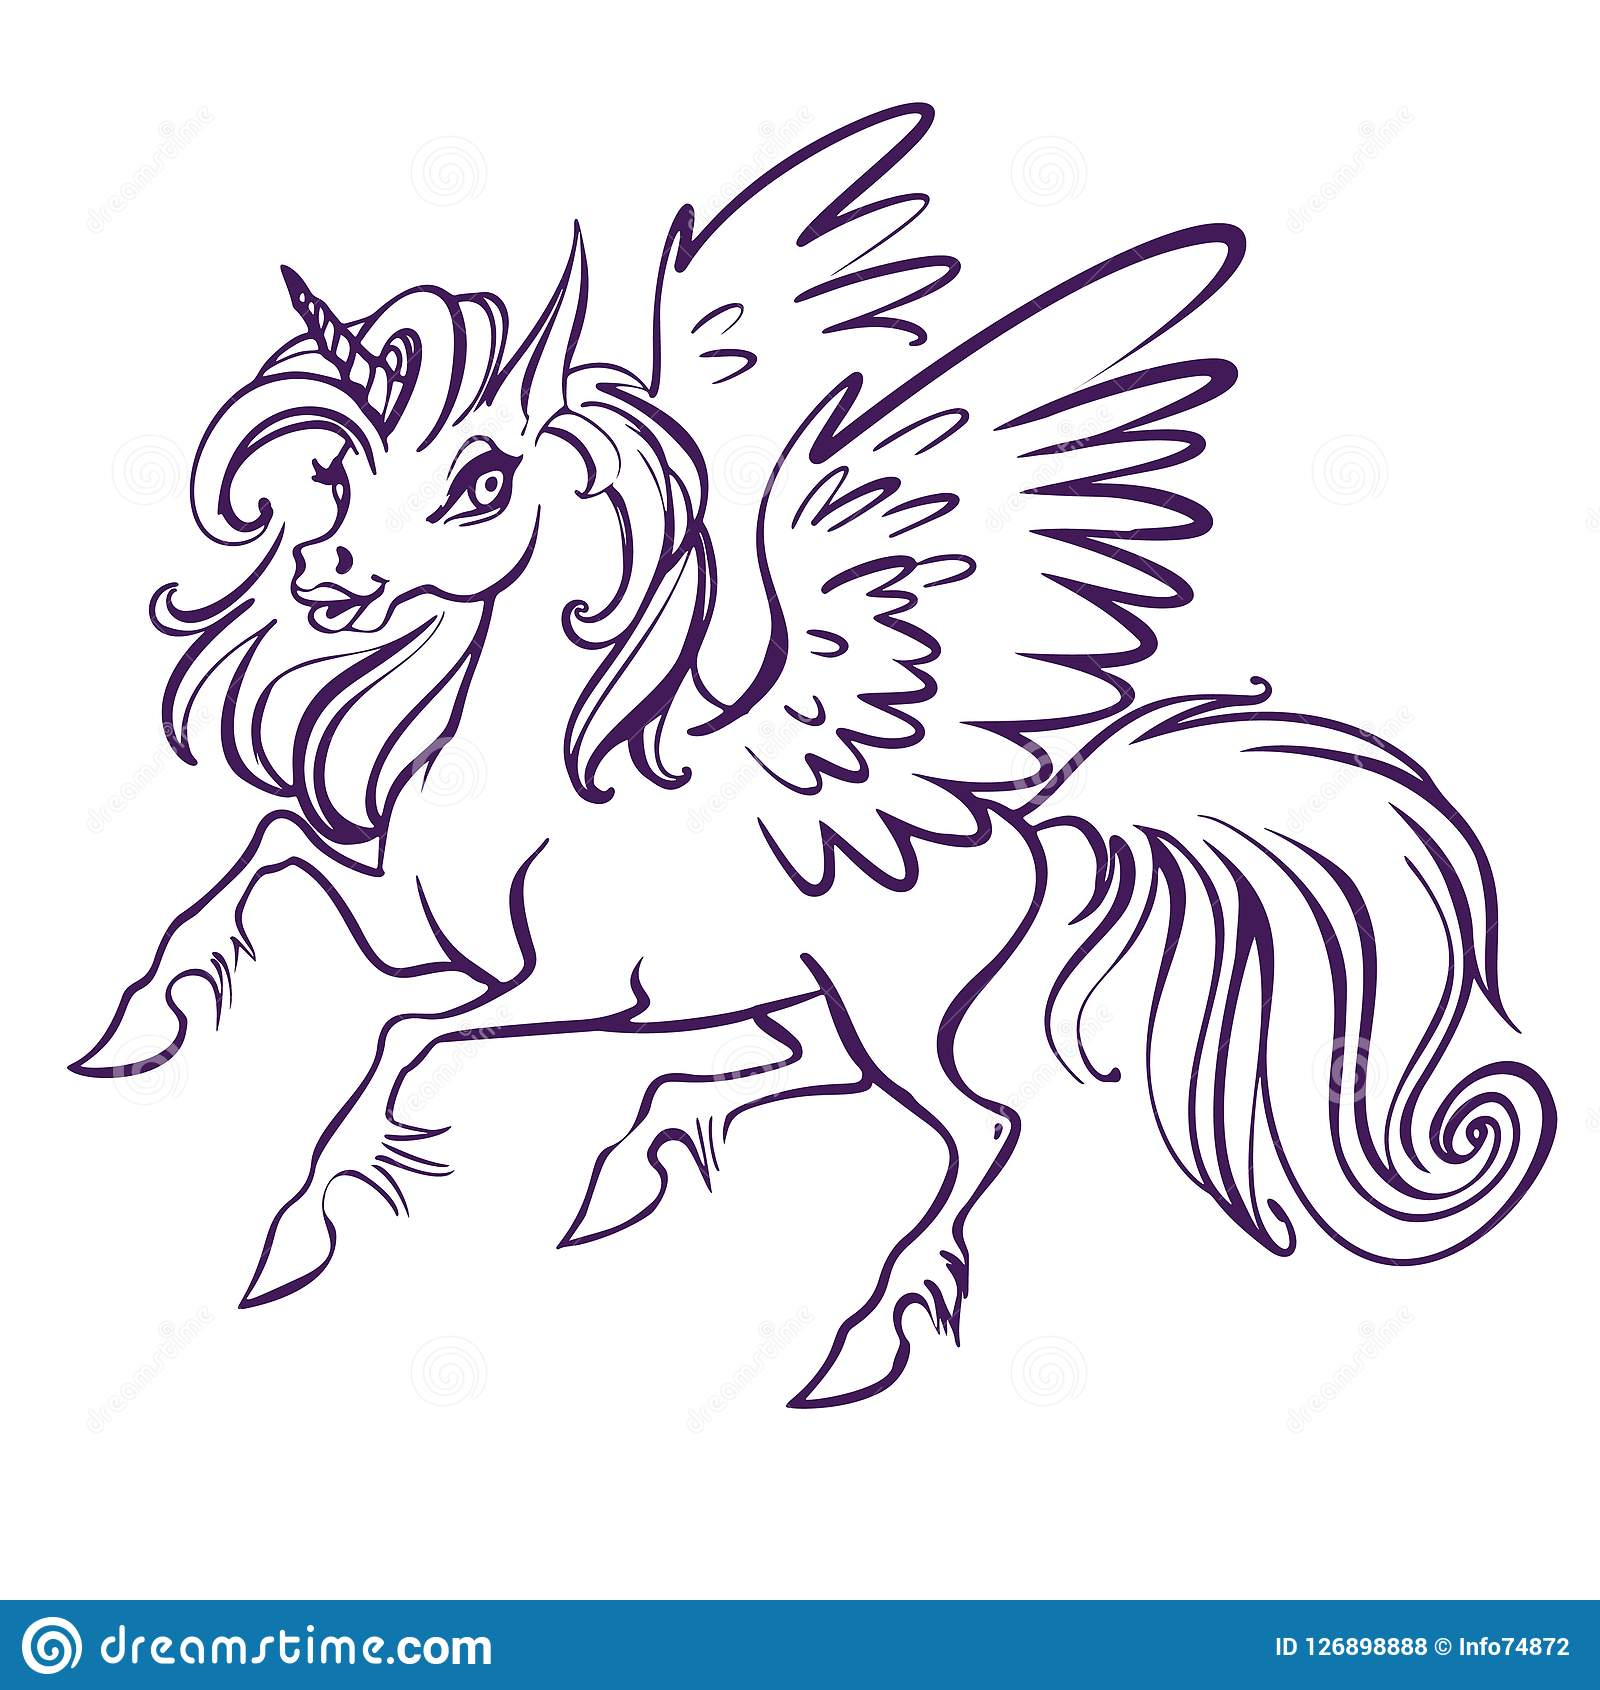 Beautiful Unicorn Vector Illustration Magic Fantasy Horse Design For Kids T Shirt And Bags Unicorn With Rainbow Hairs Stock Illustration Illustration Of Horn Symbol 126898888